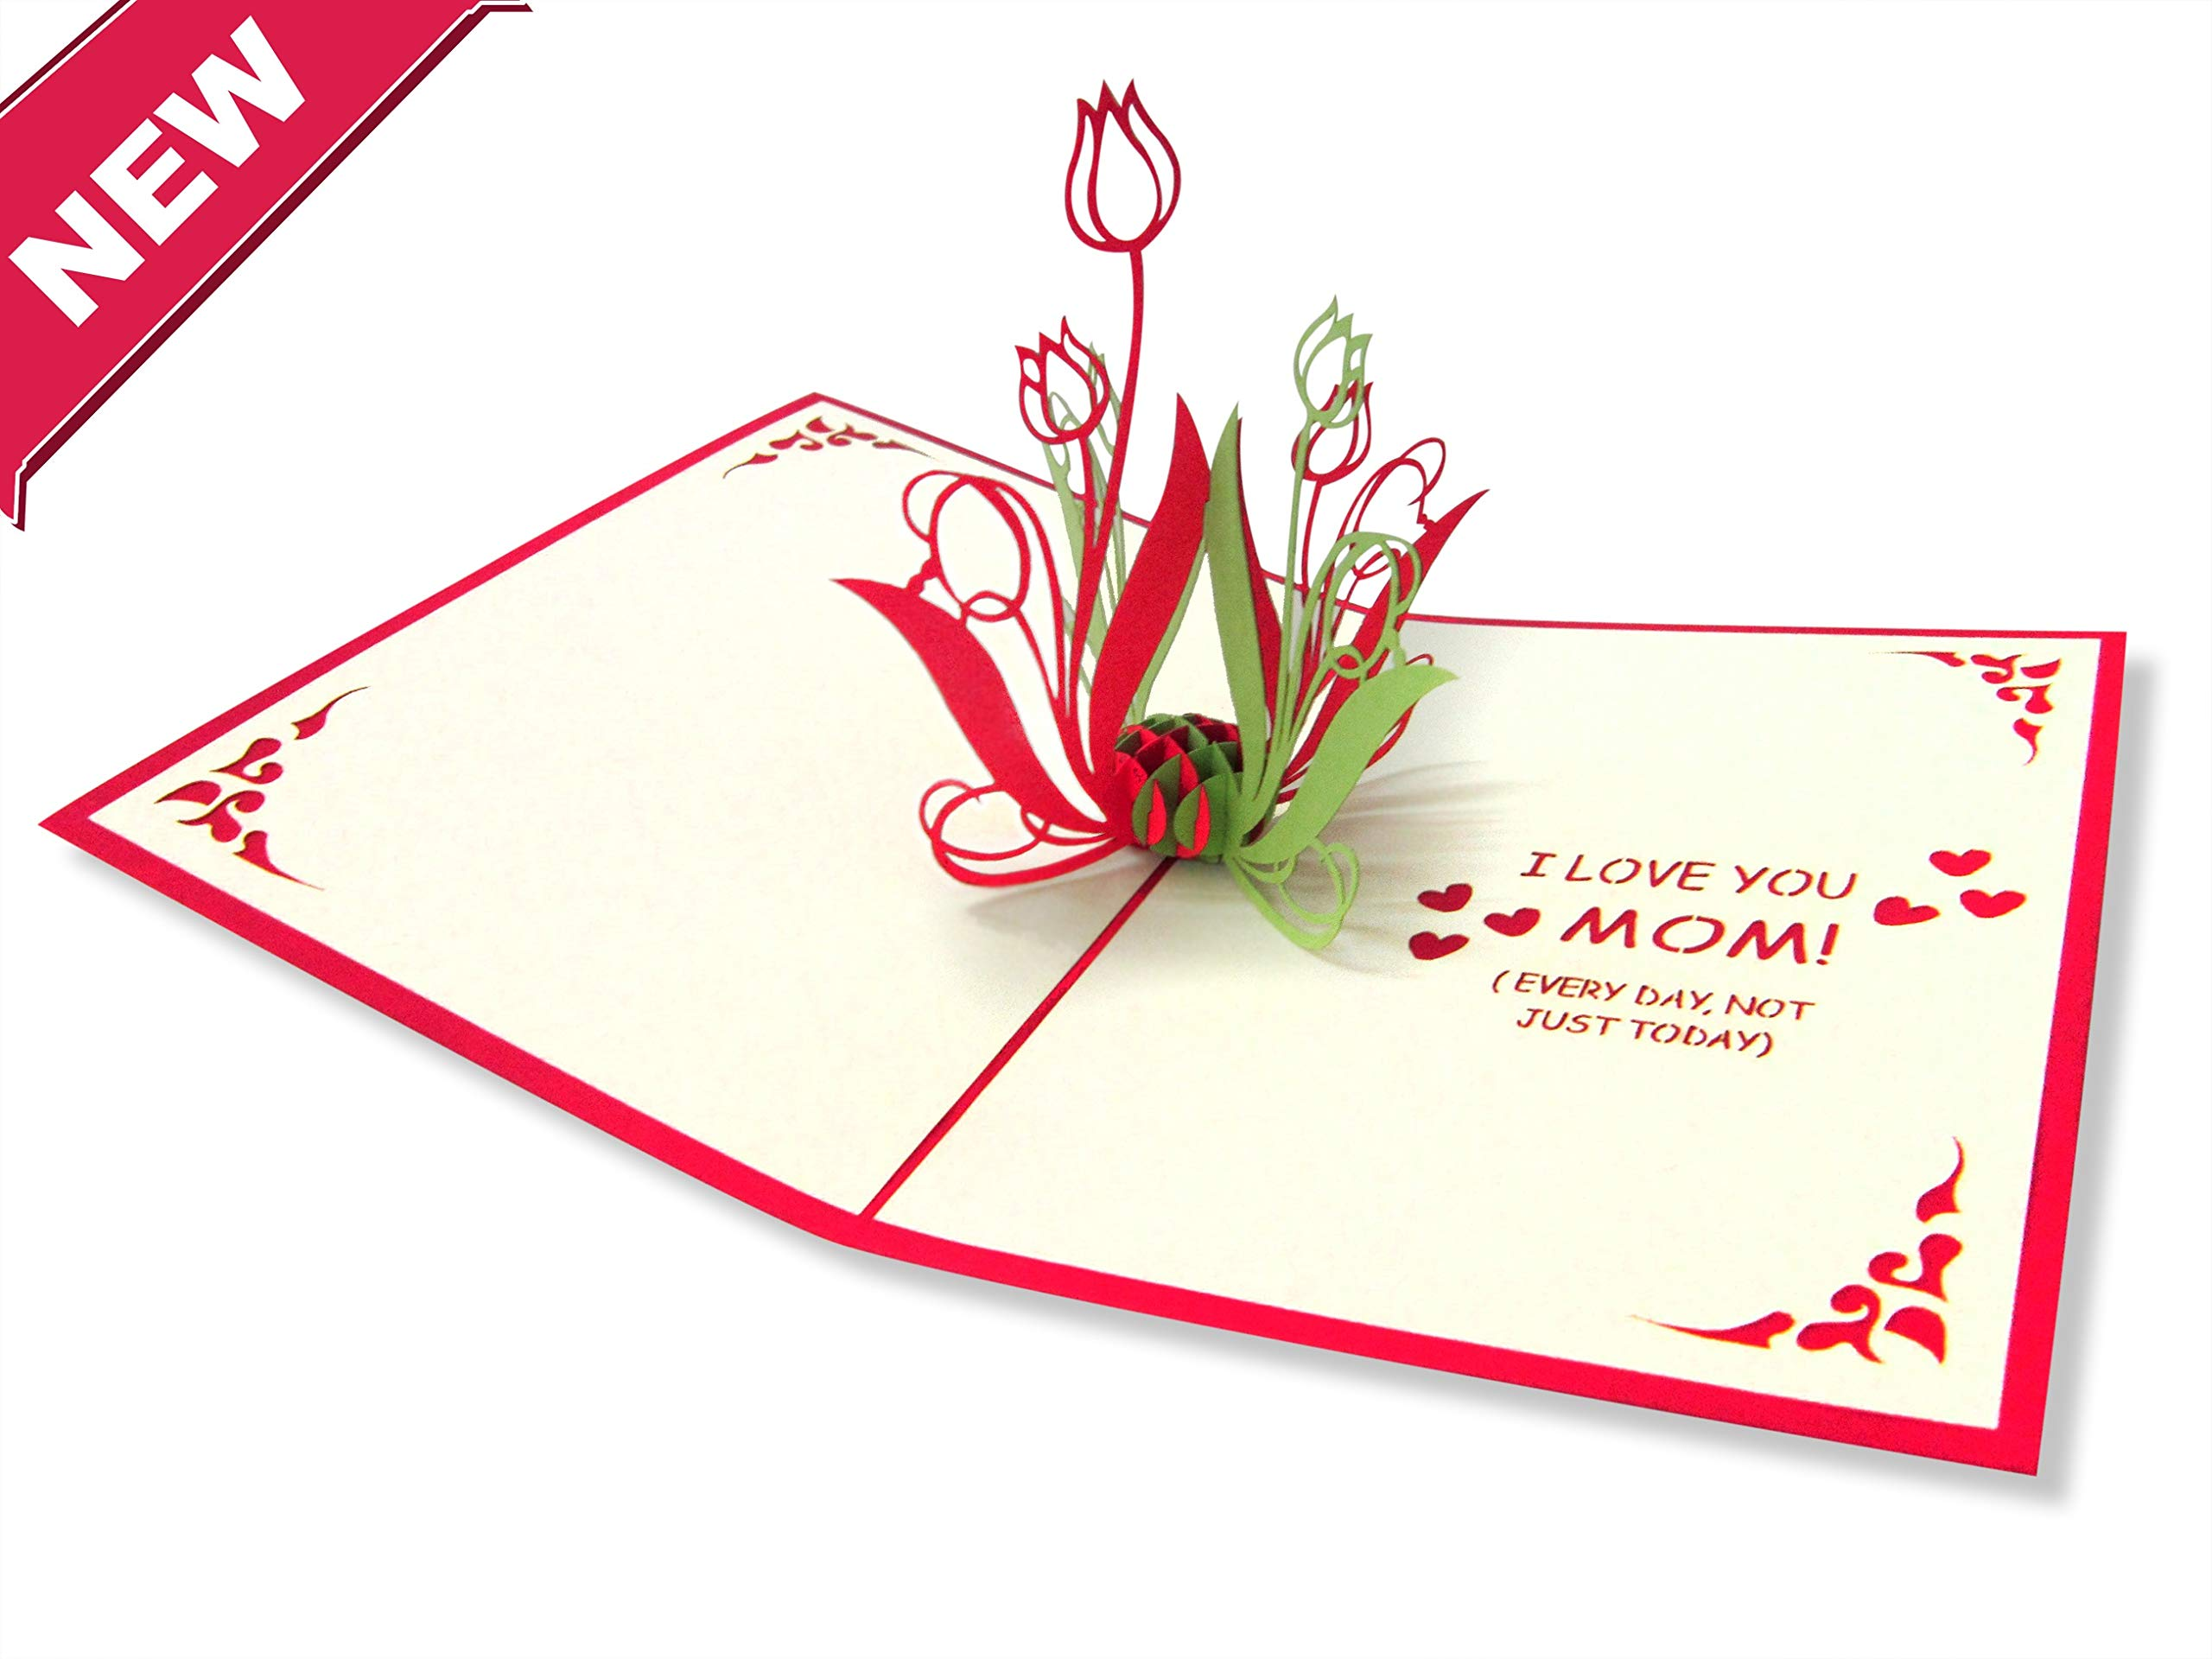 3D Cards Pop Up Flowers Tulips Love Mom Birthday Card